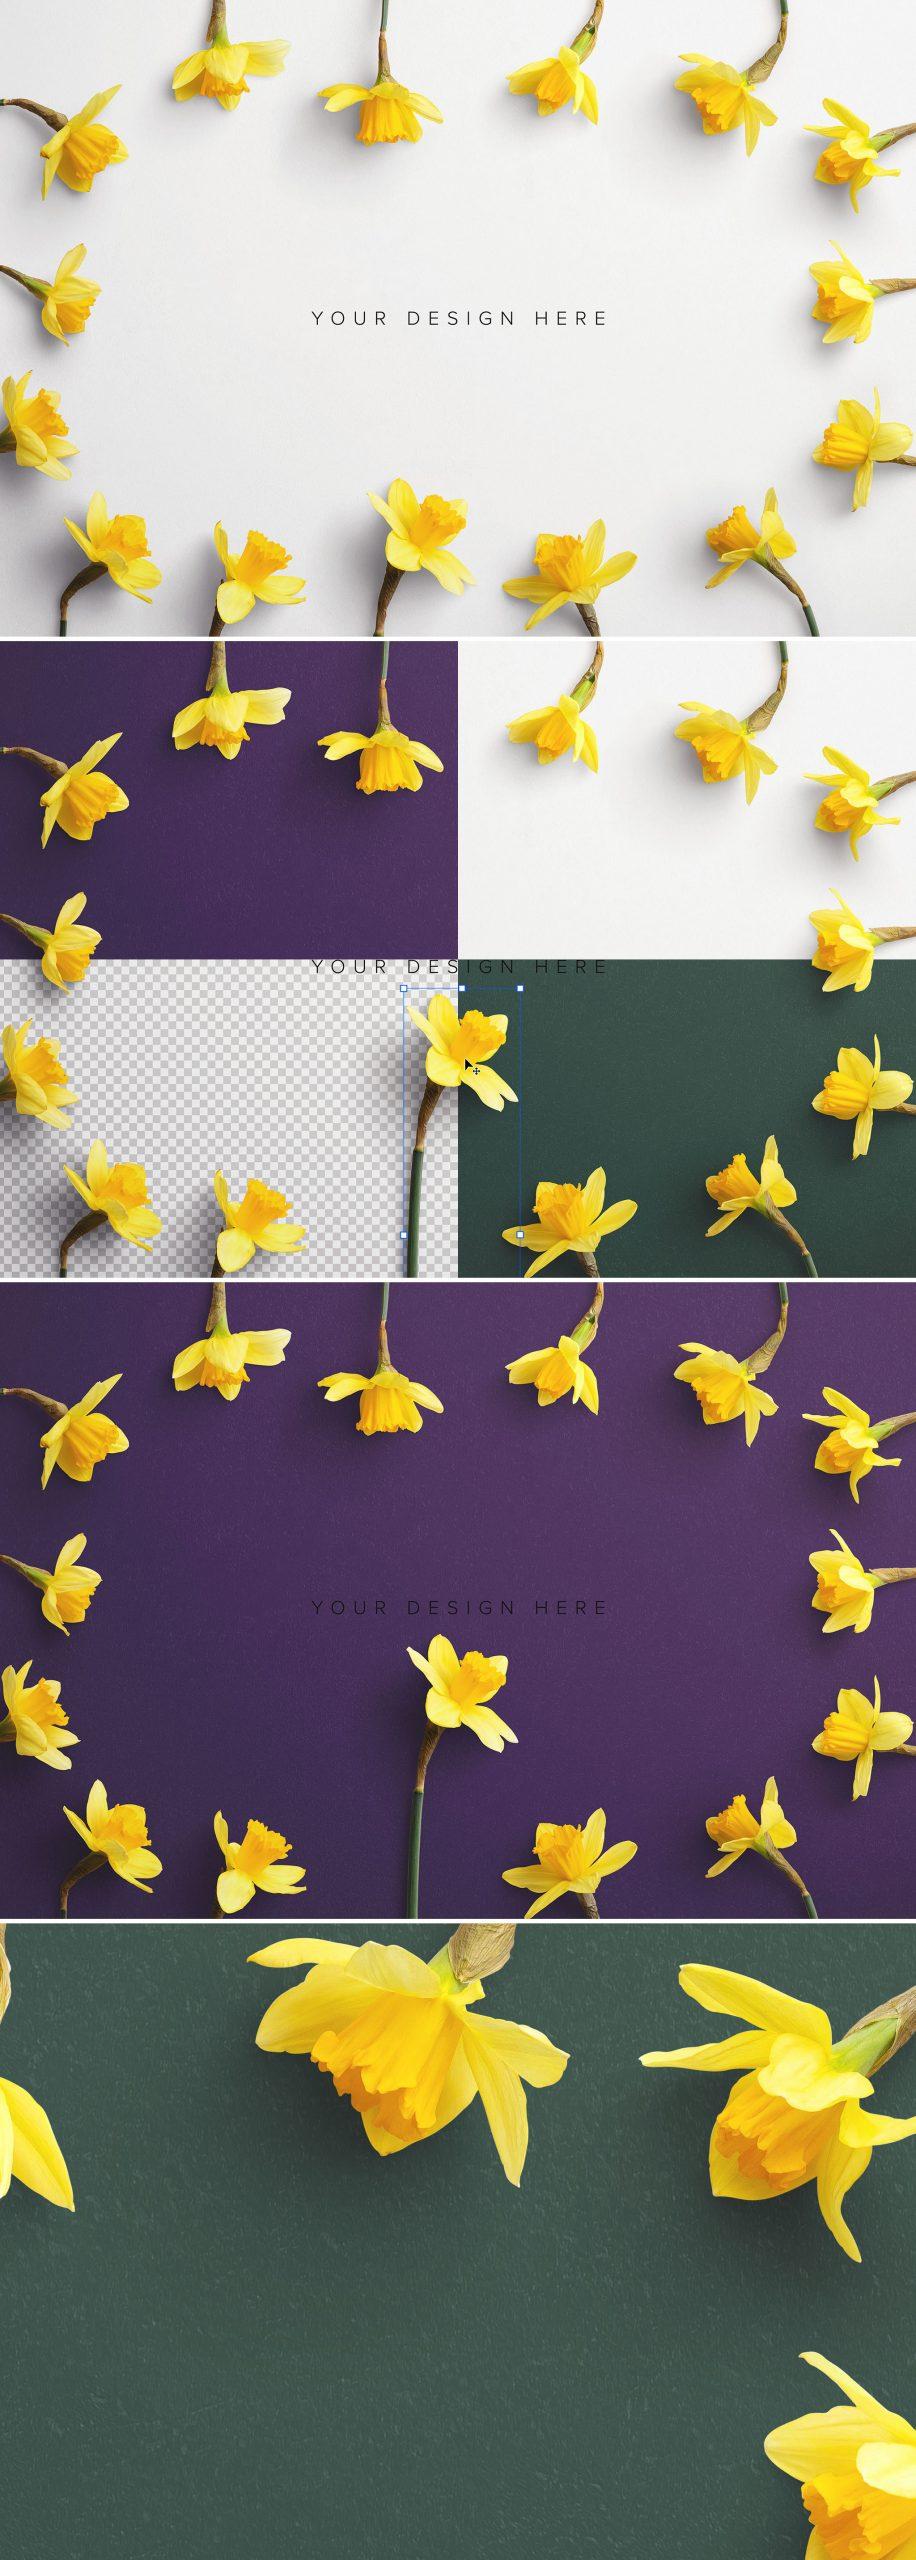 Daffodils Custom Scene Creator Template 8Preview1